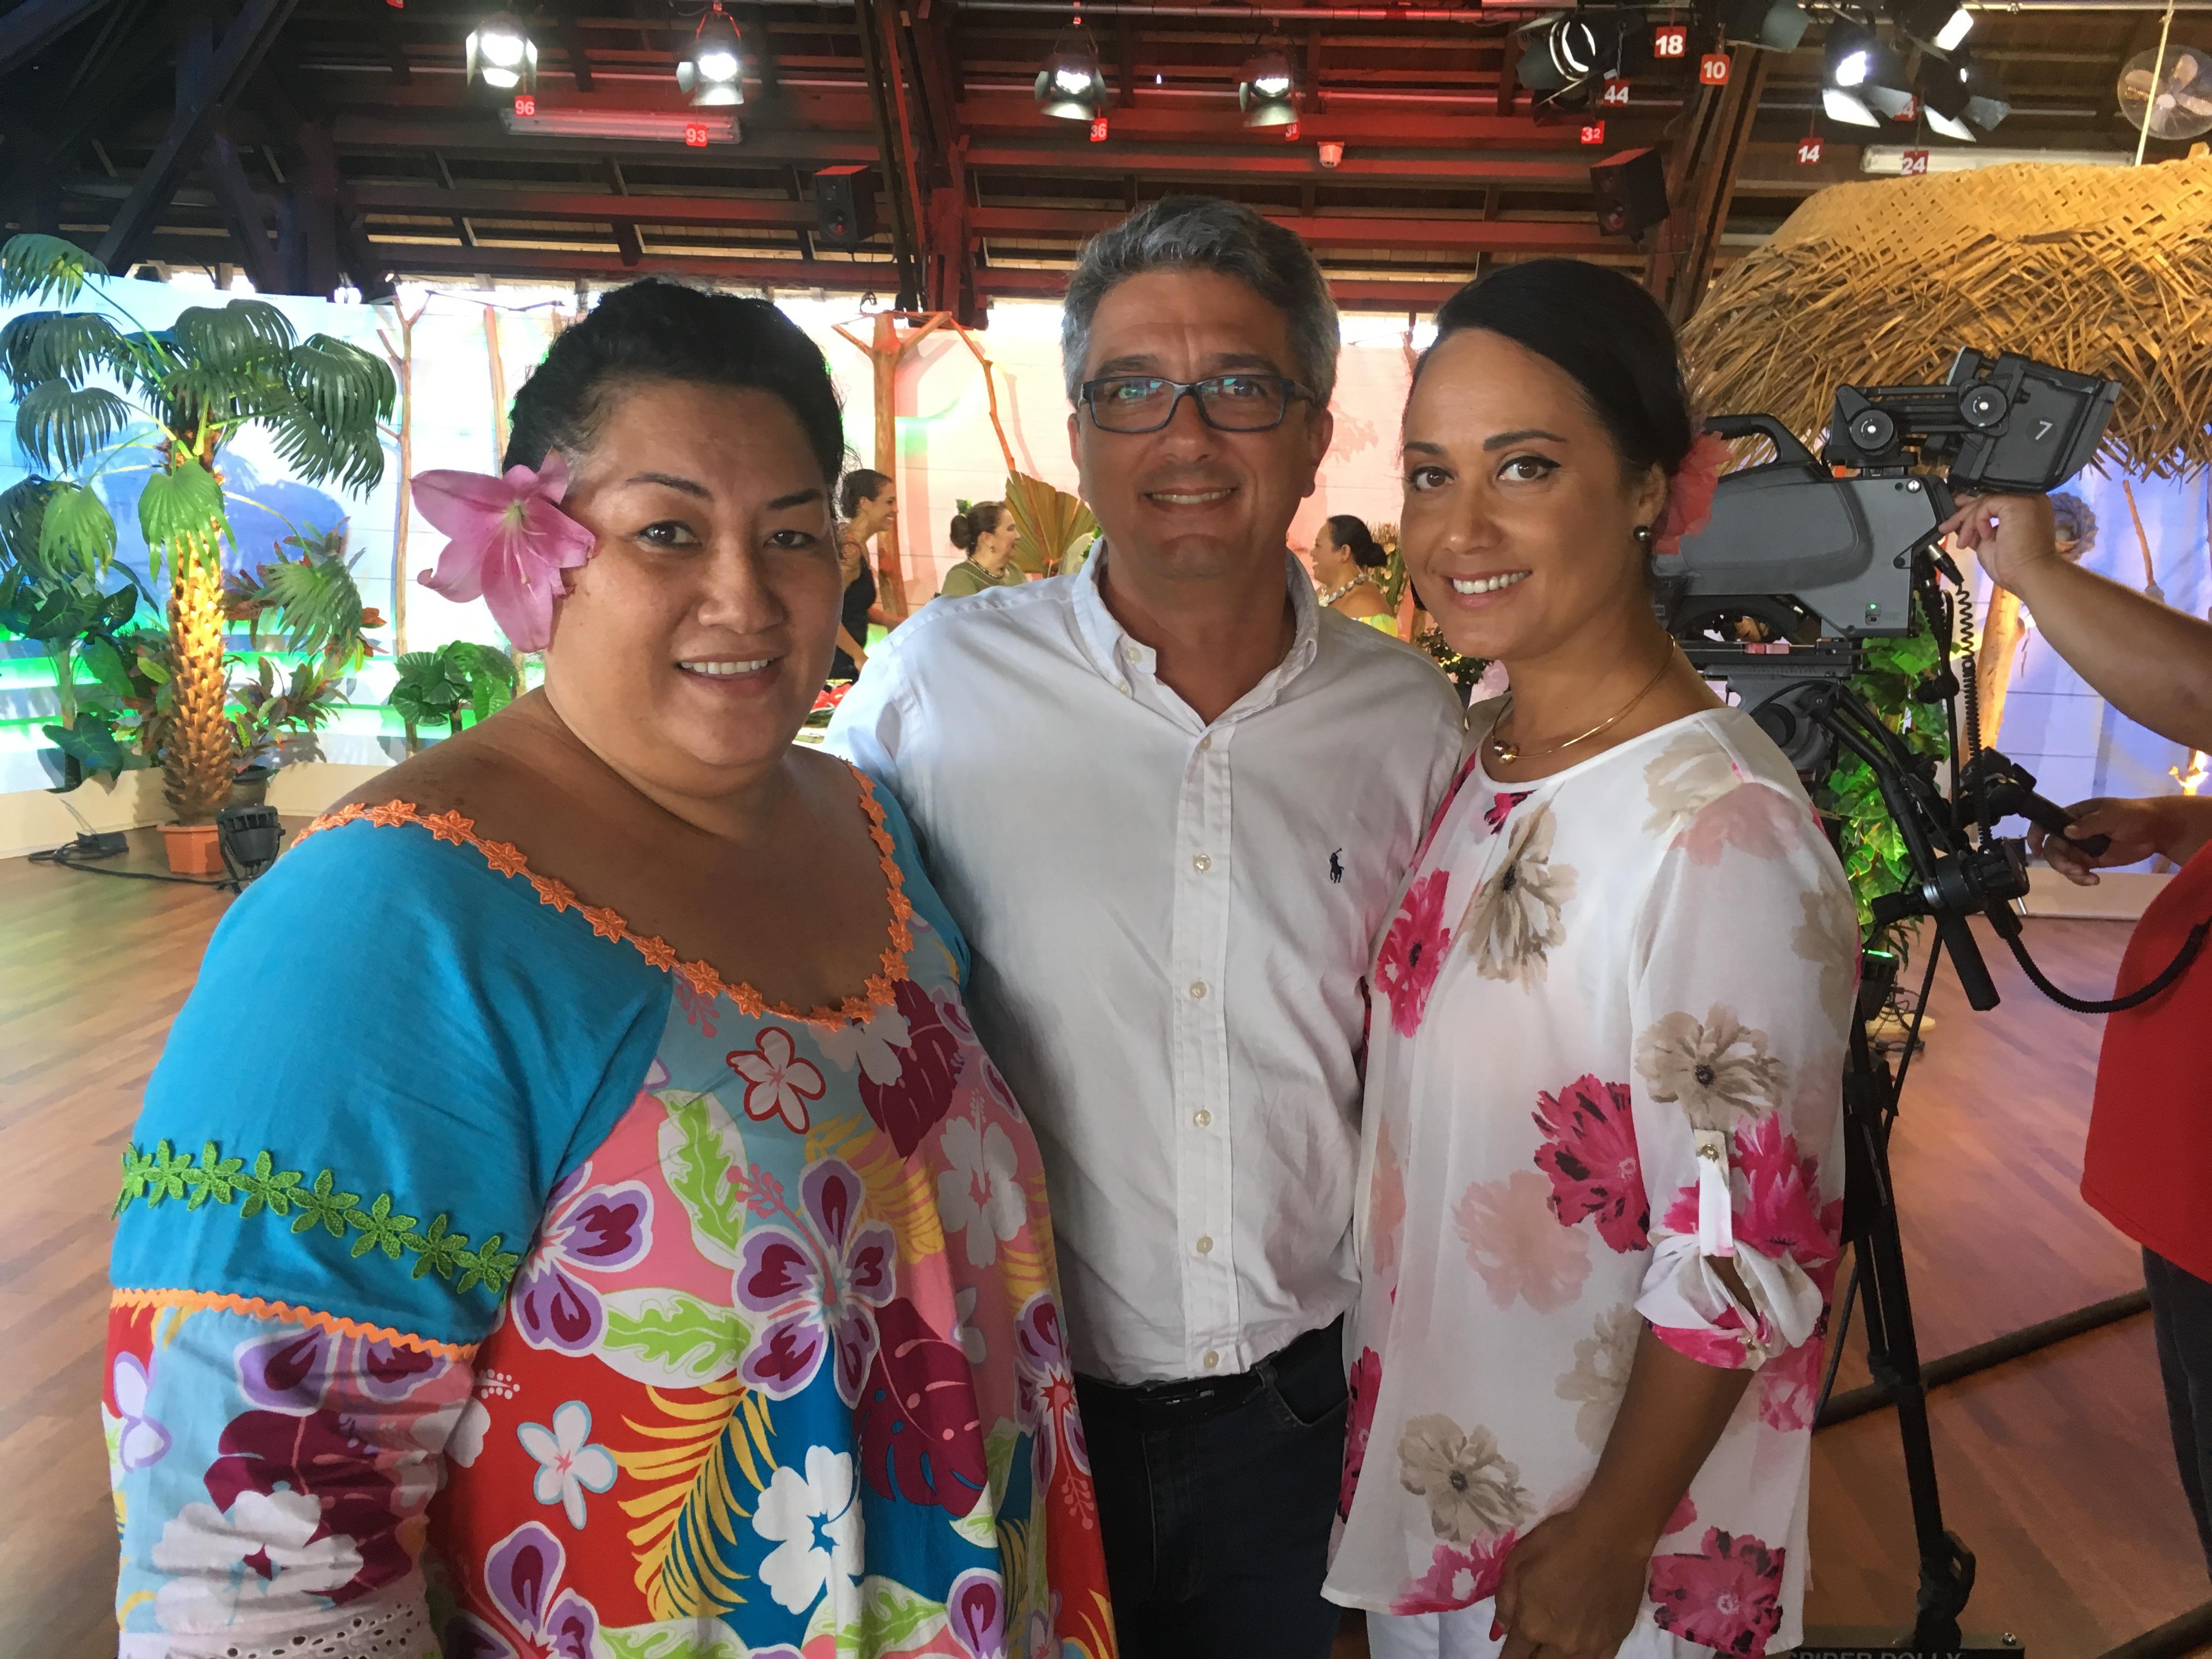 Jean-Philippe Lemée entouré de Noëlla Tau directrice de Polynésie 1ère radio, et de Stella Taaroaema qui lui succède par interim